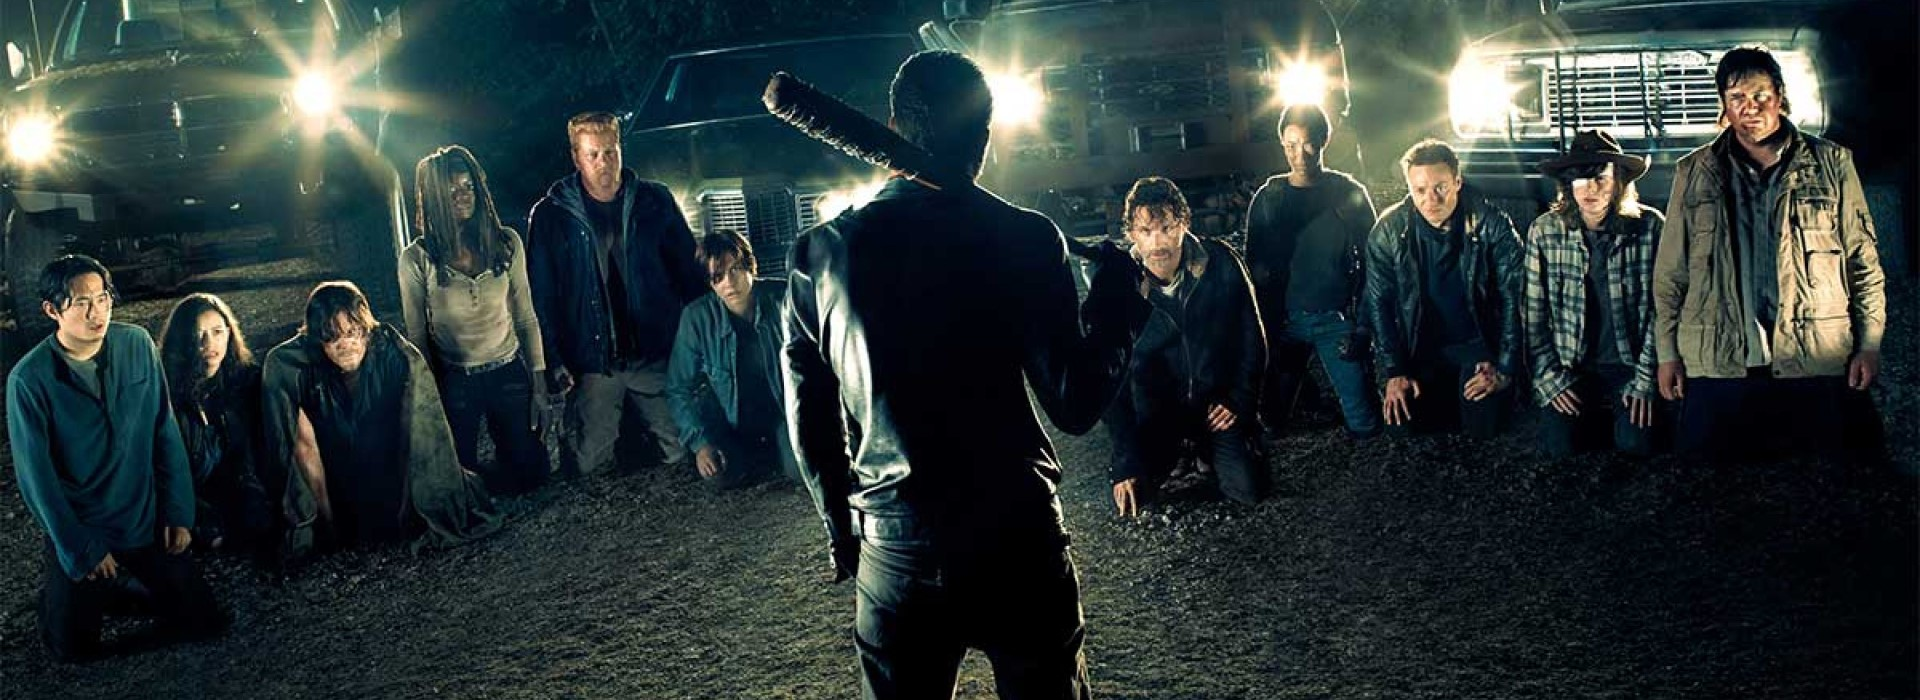 The Walking Dead Season 7 720p cover